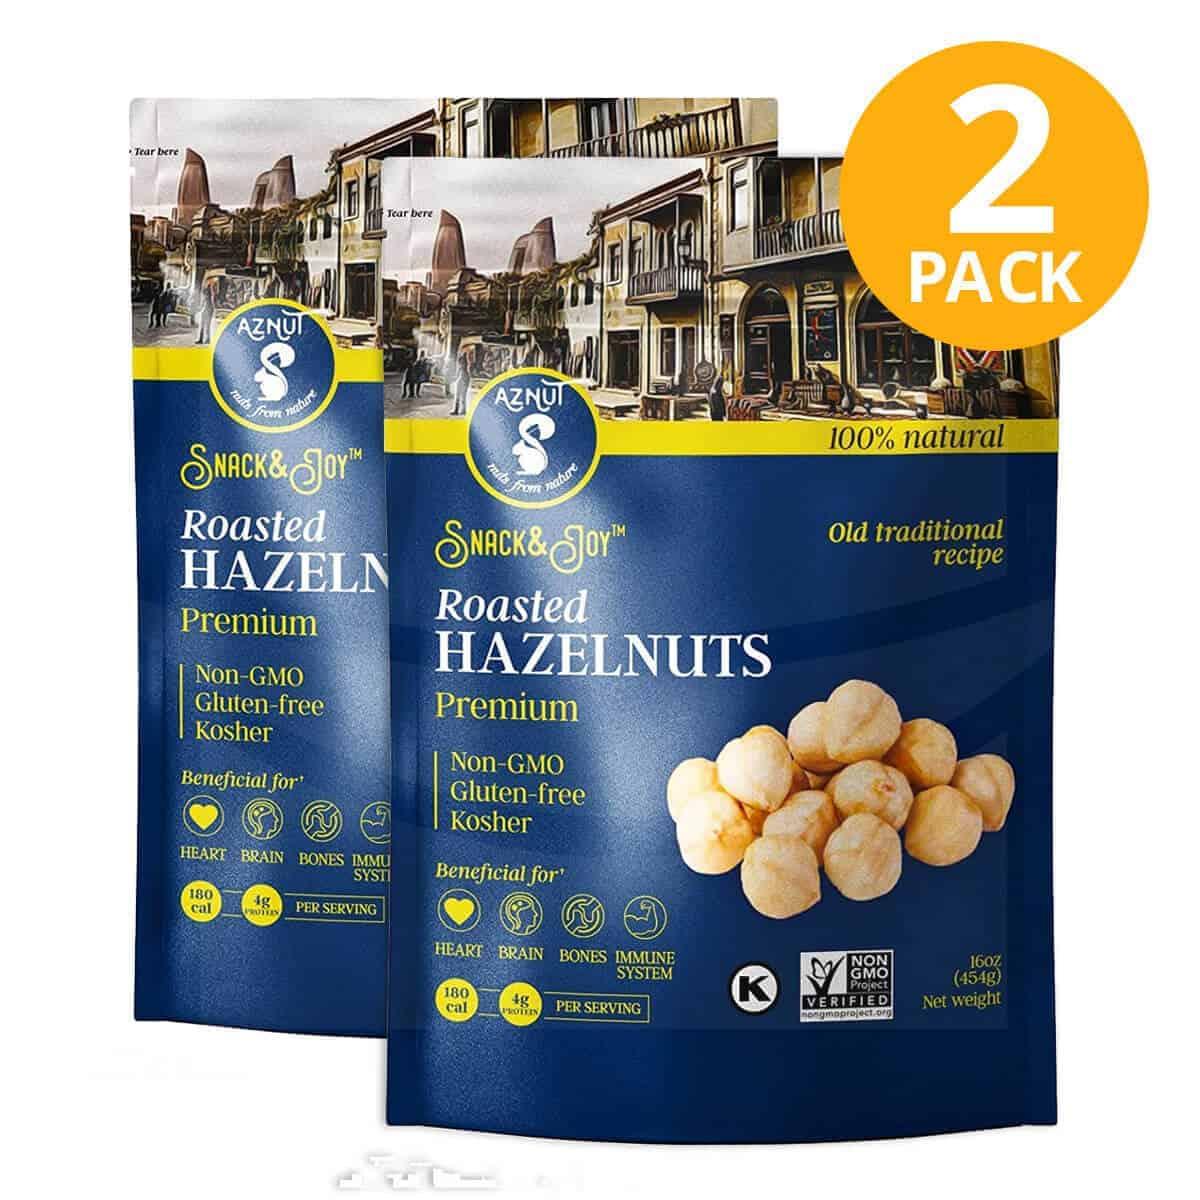 Avellanas Tostadas, Aznut Premium Roasted Hazelnuts Unsalted, 6 OZ (Pack de 2)